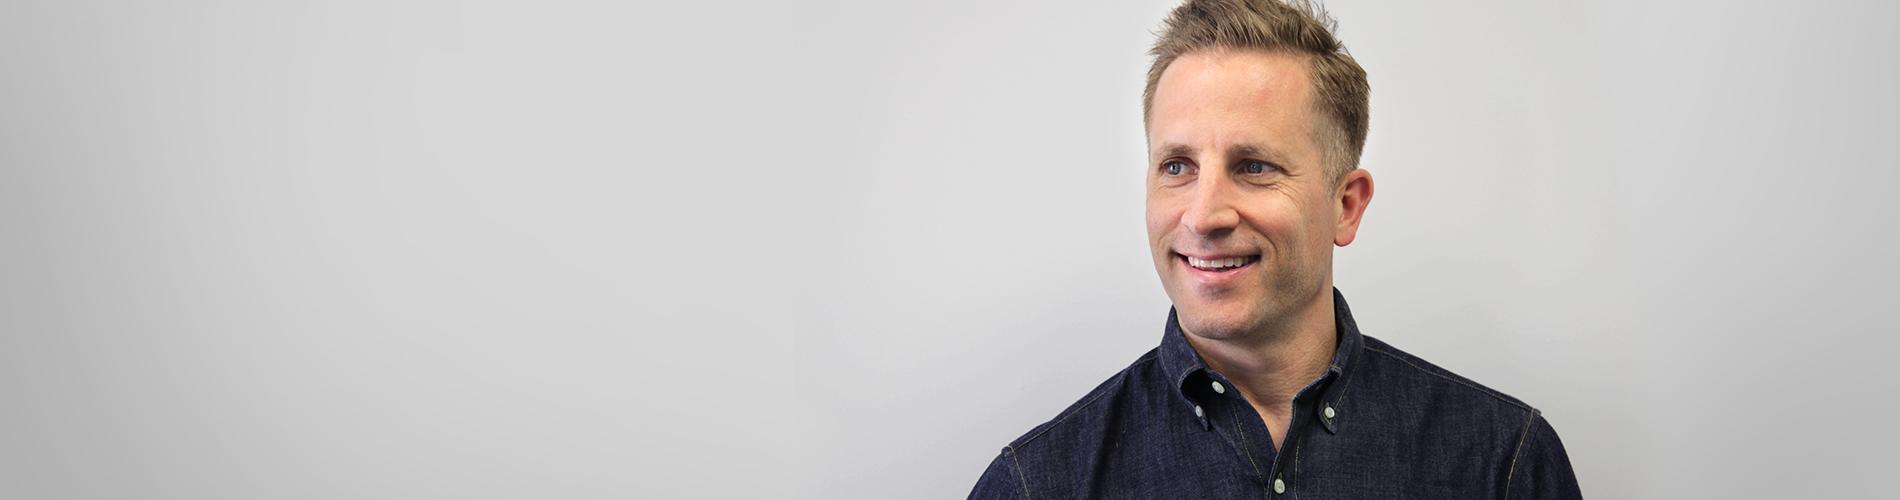 Dylan Bernd Joins as Executive Creative Director